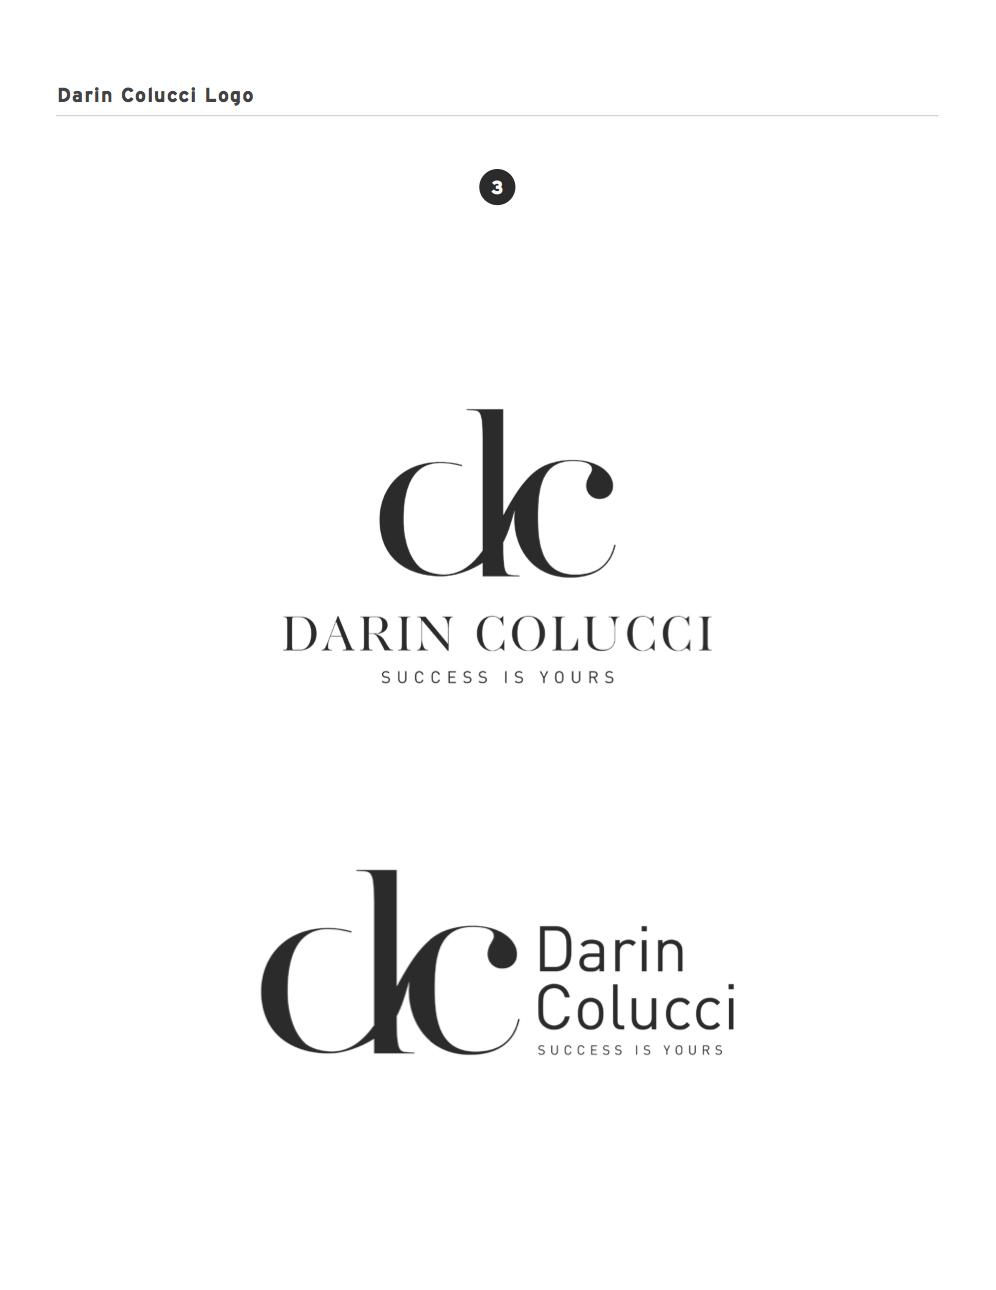 Darin Colucci Logo Options